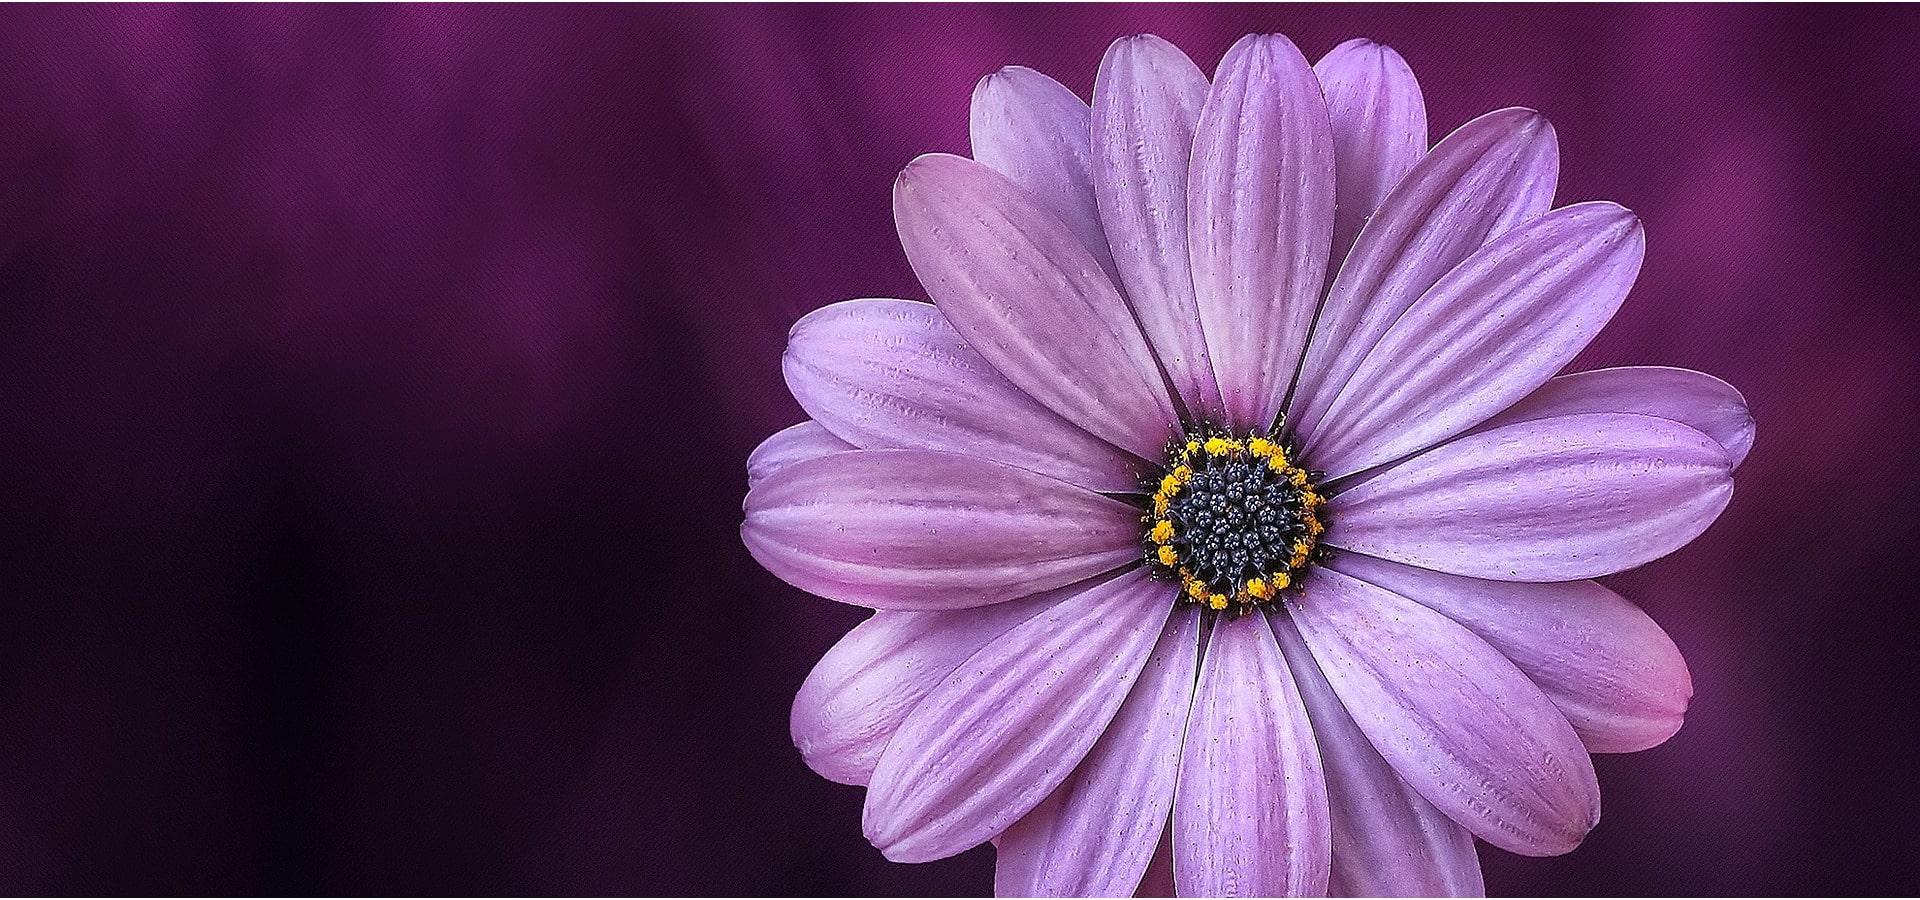 pink flower on purple background